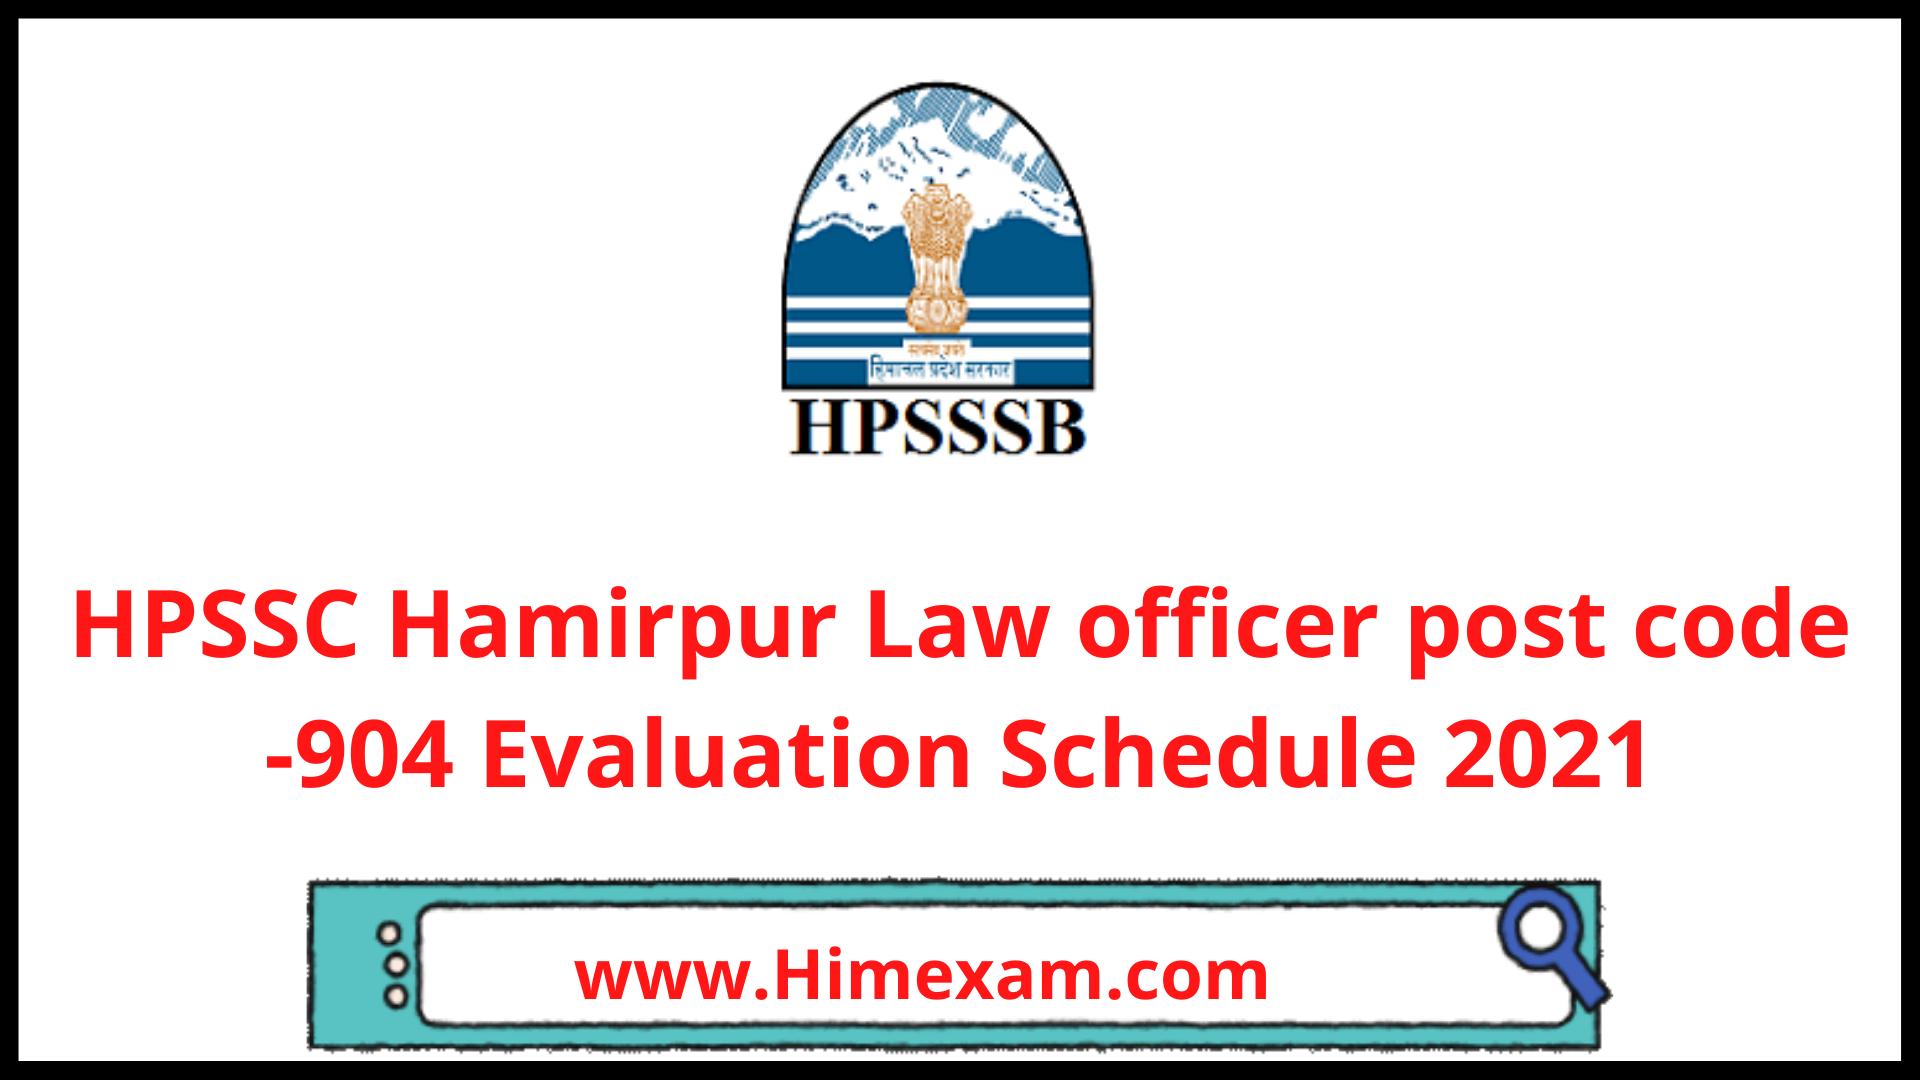 HPSSC Hamirpur Law officer post code -904 Evaluation Schedule 2021